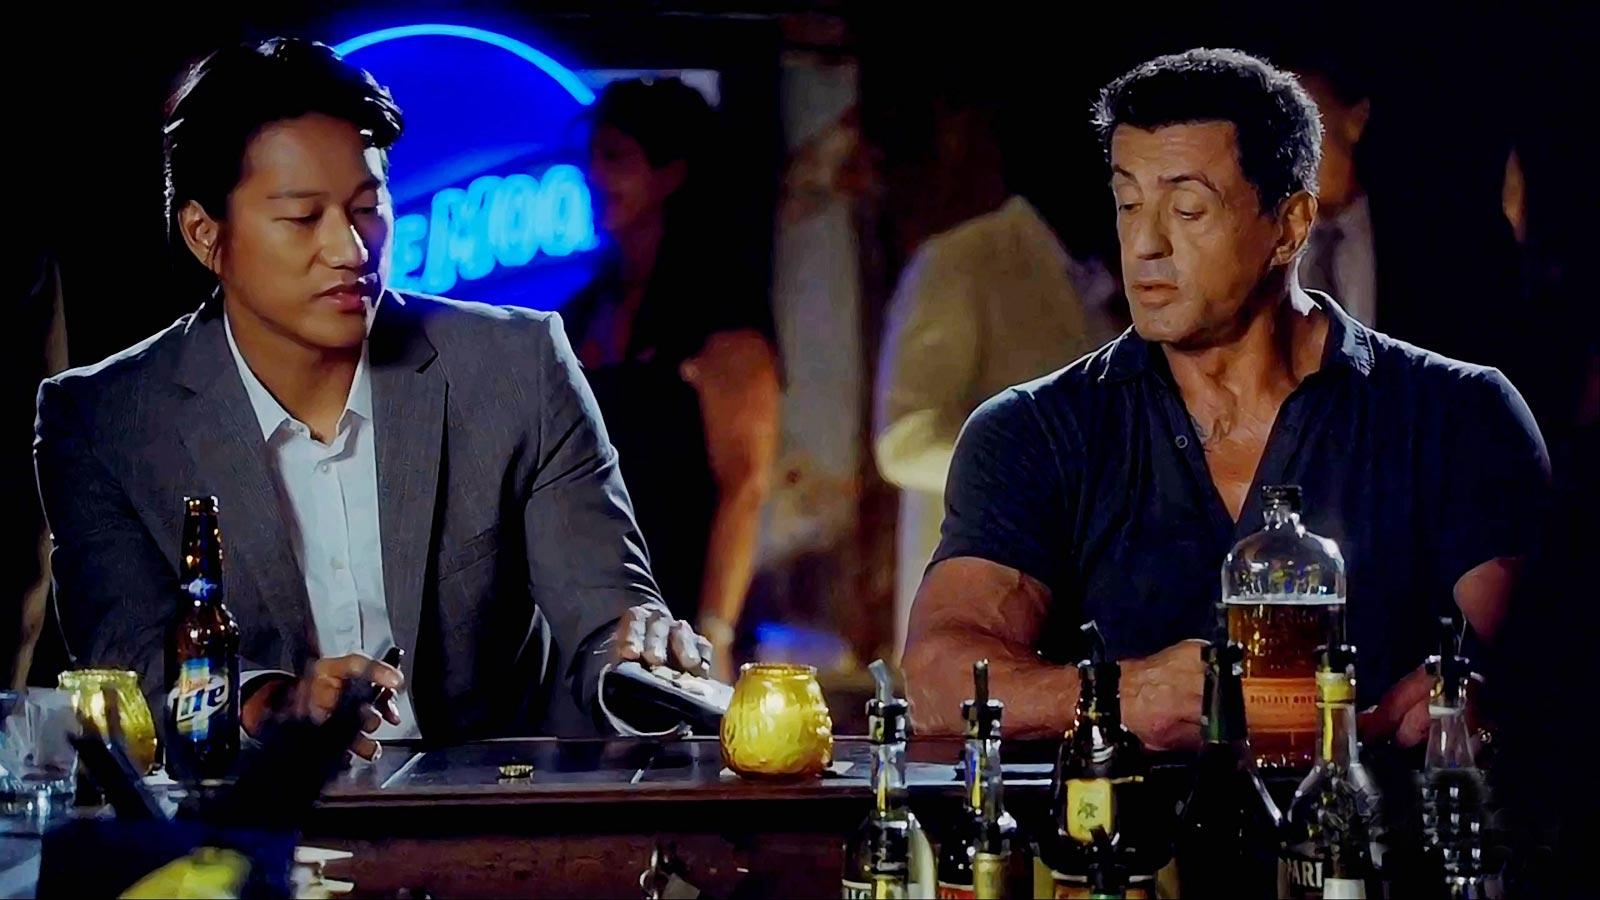 Film Review – Bullet to the Head (2012) | Jordan and Eddie ...